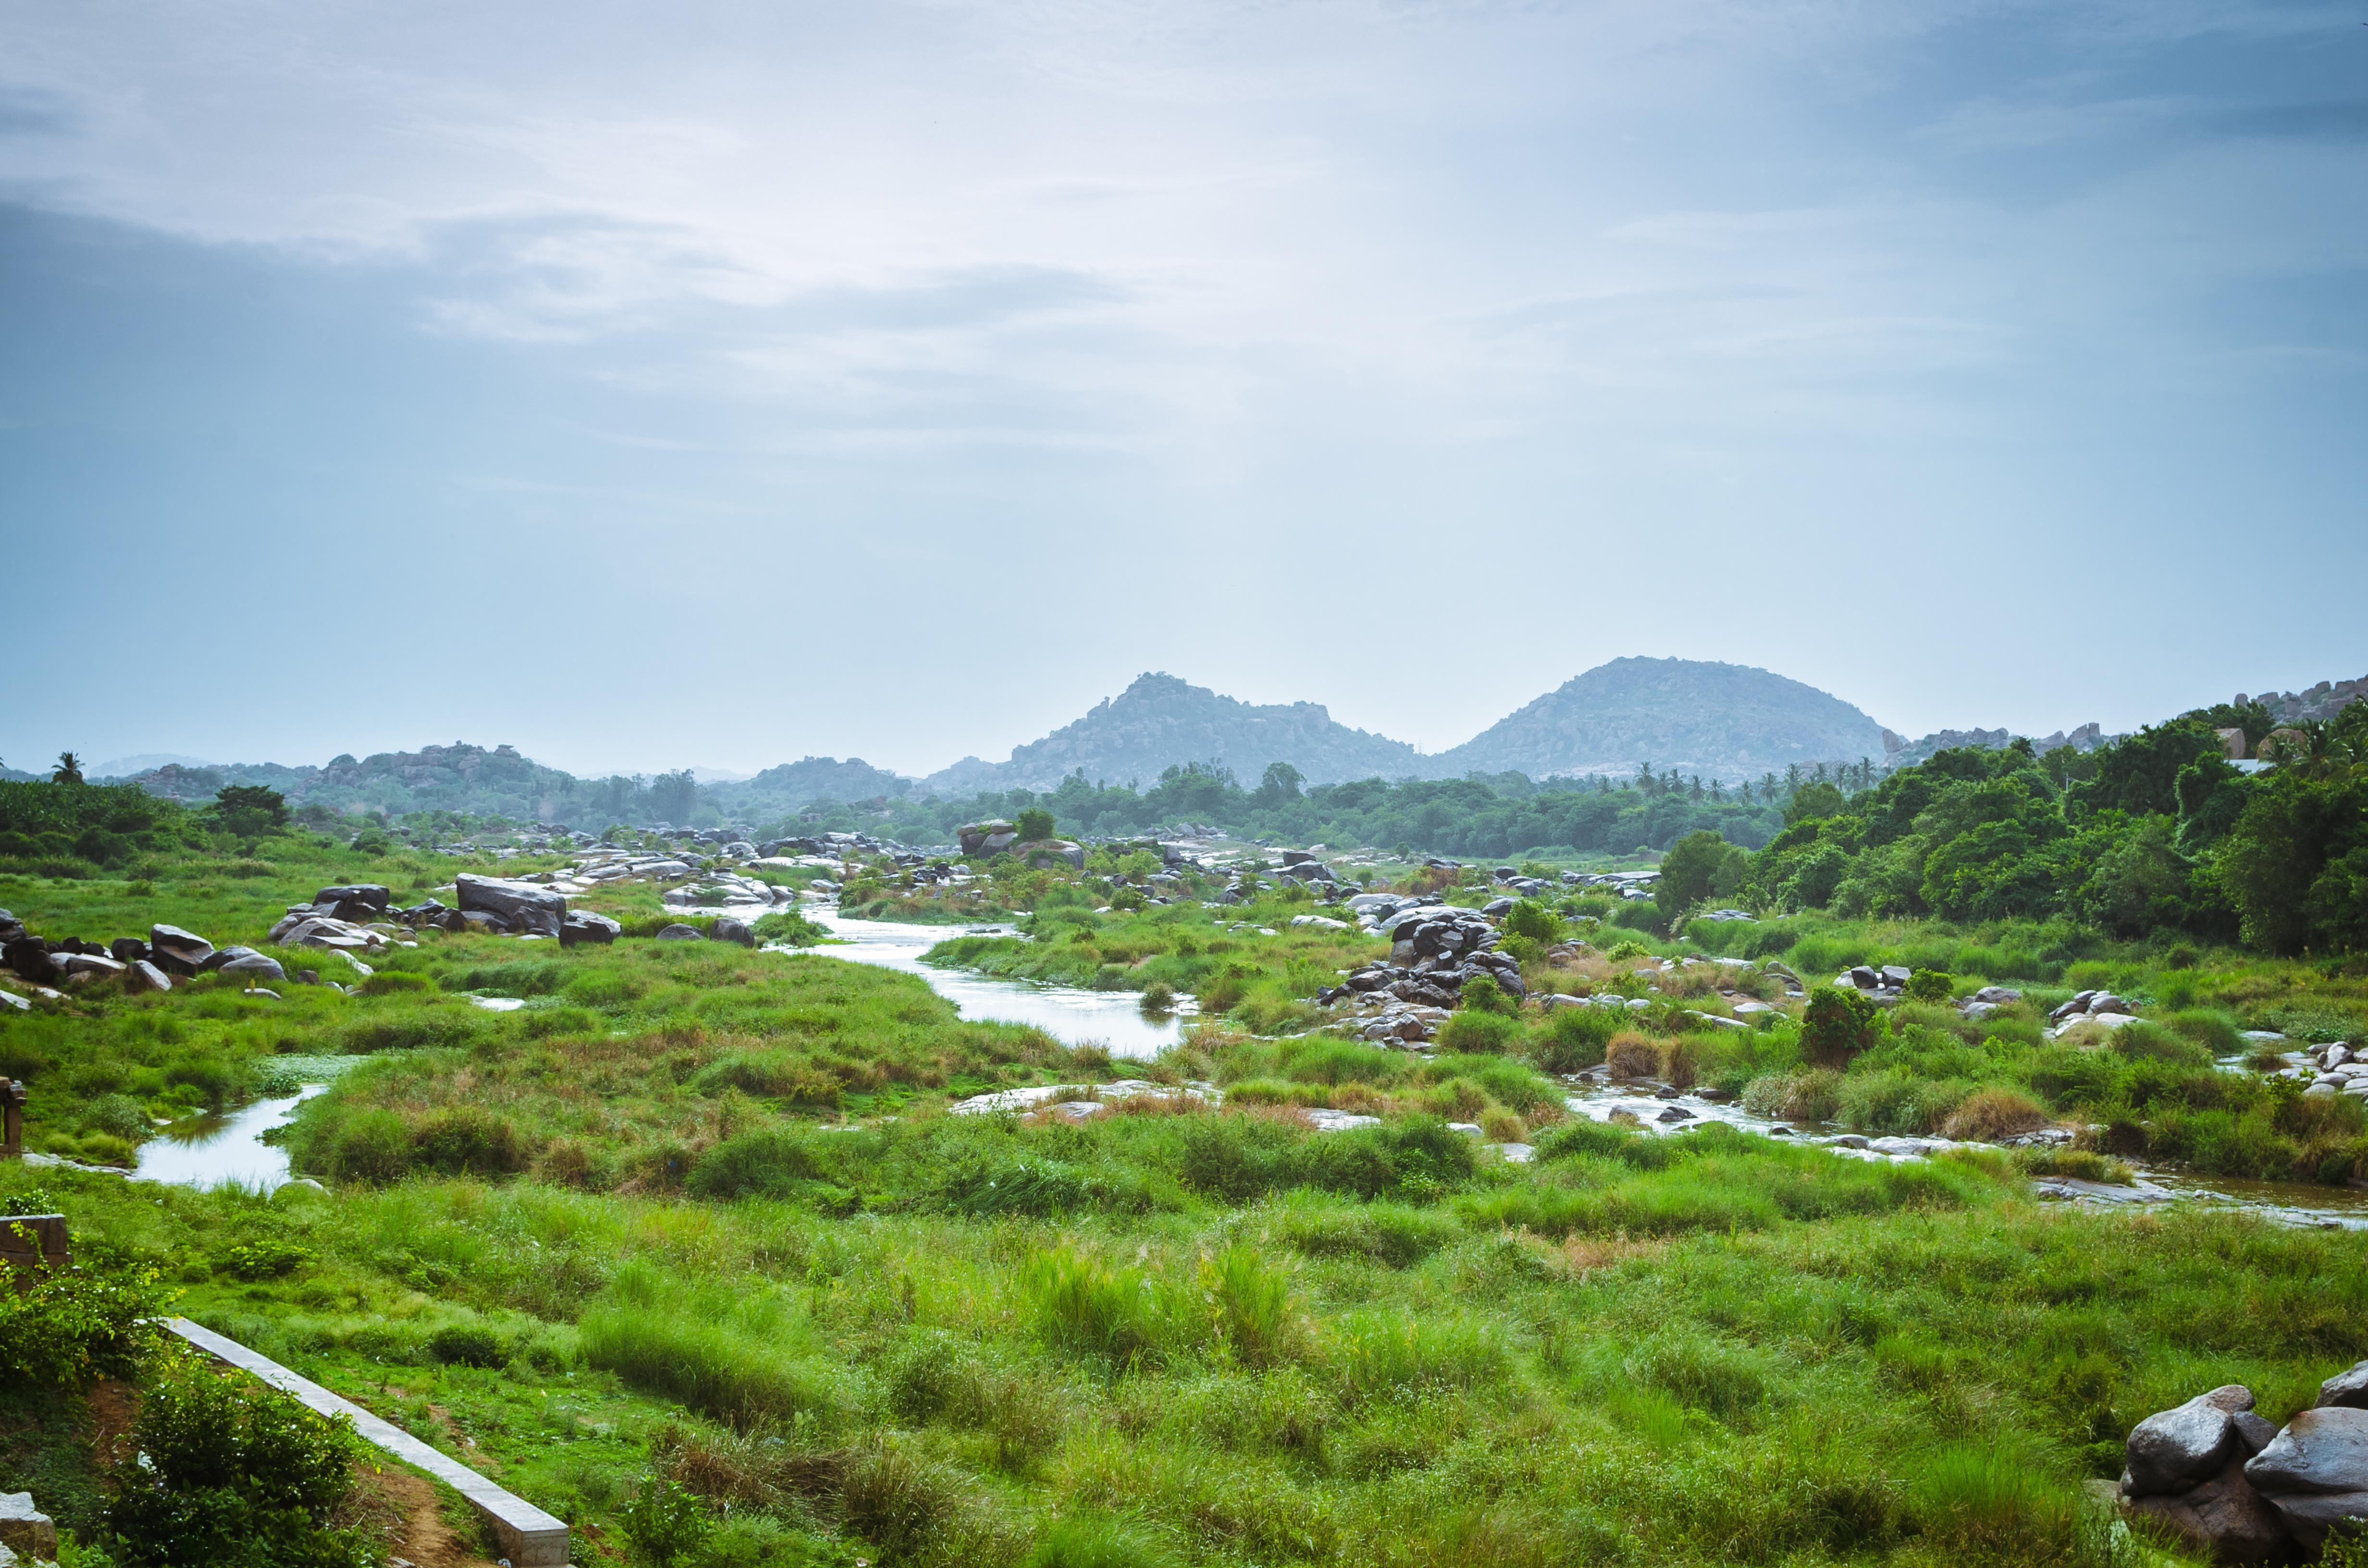 Looking through the ruins of Hampi Karnataka India [OC] [4928x3624]